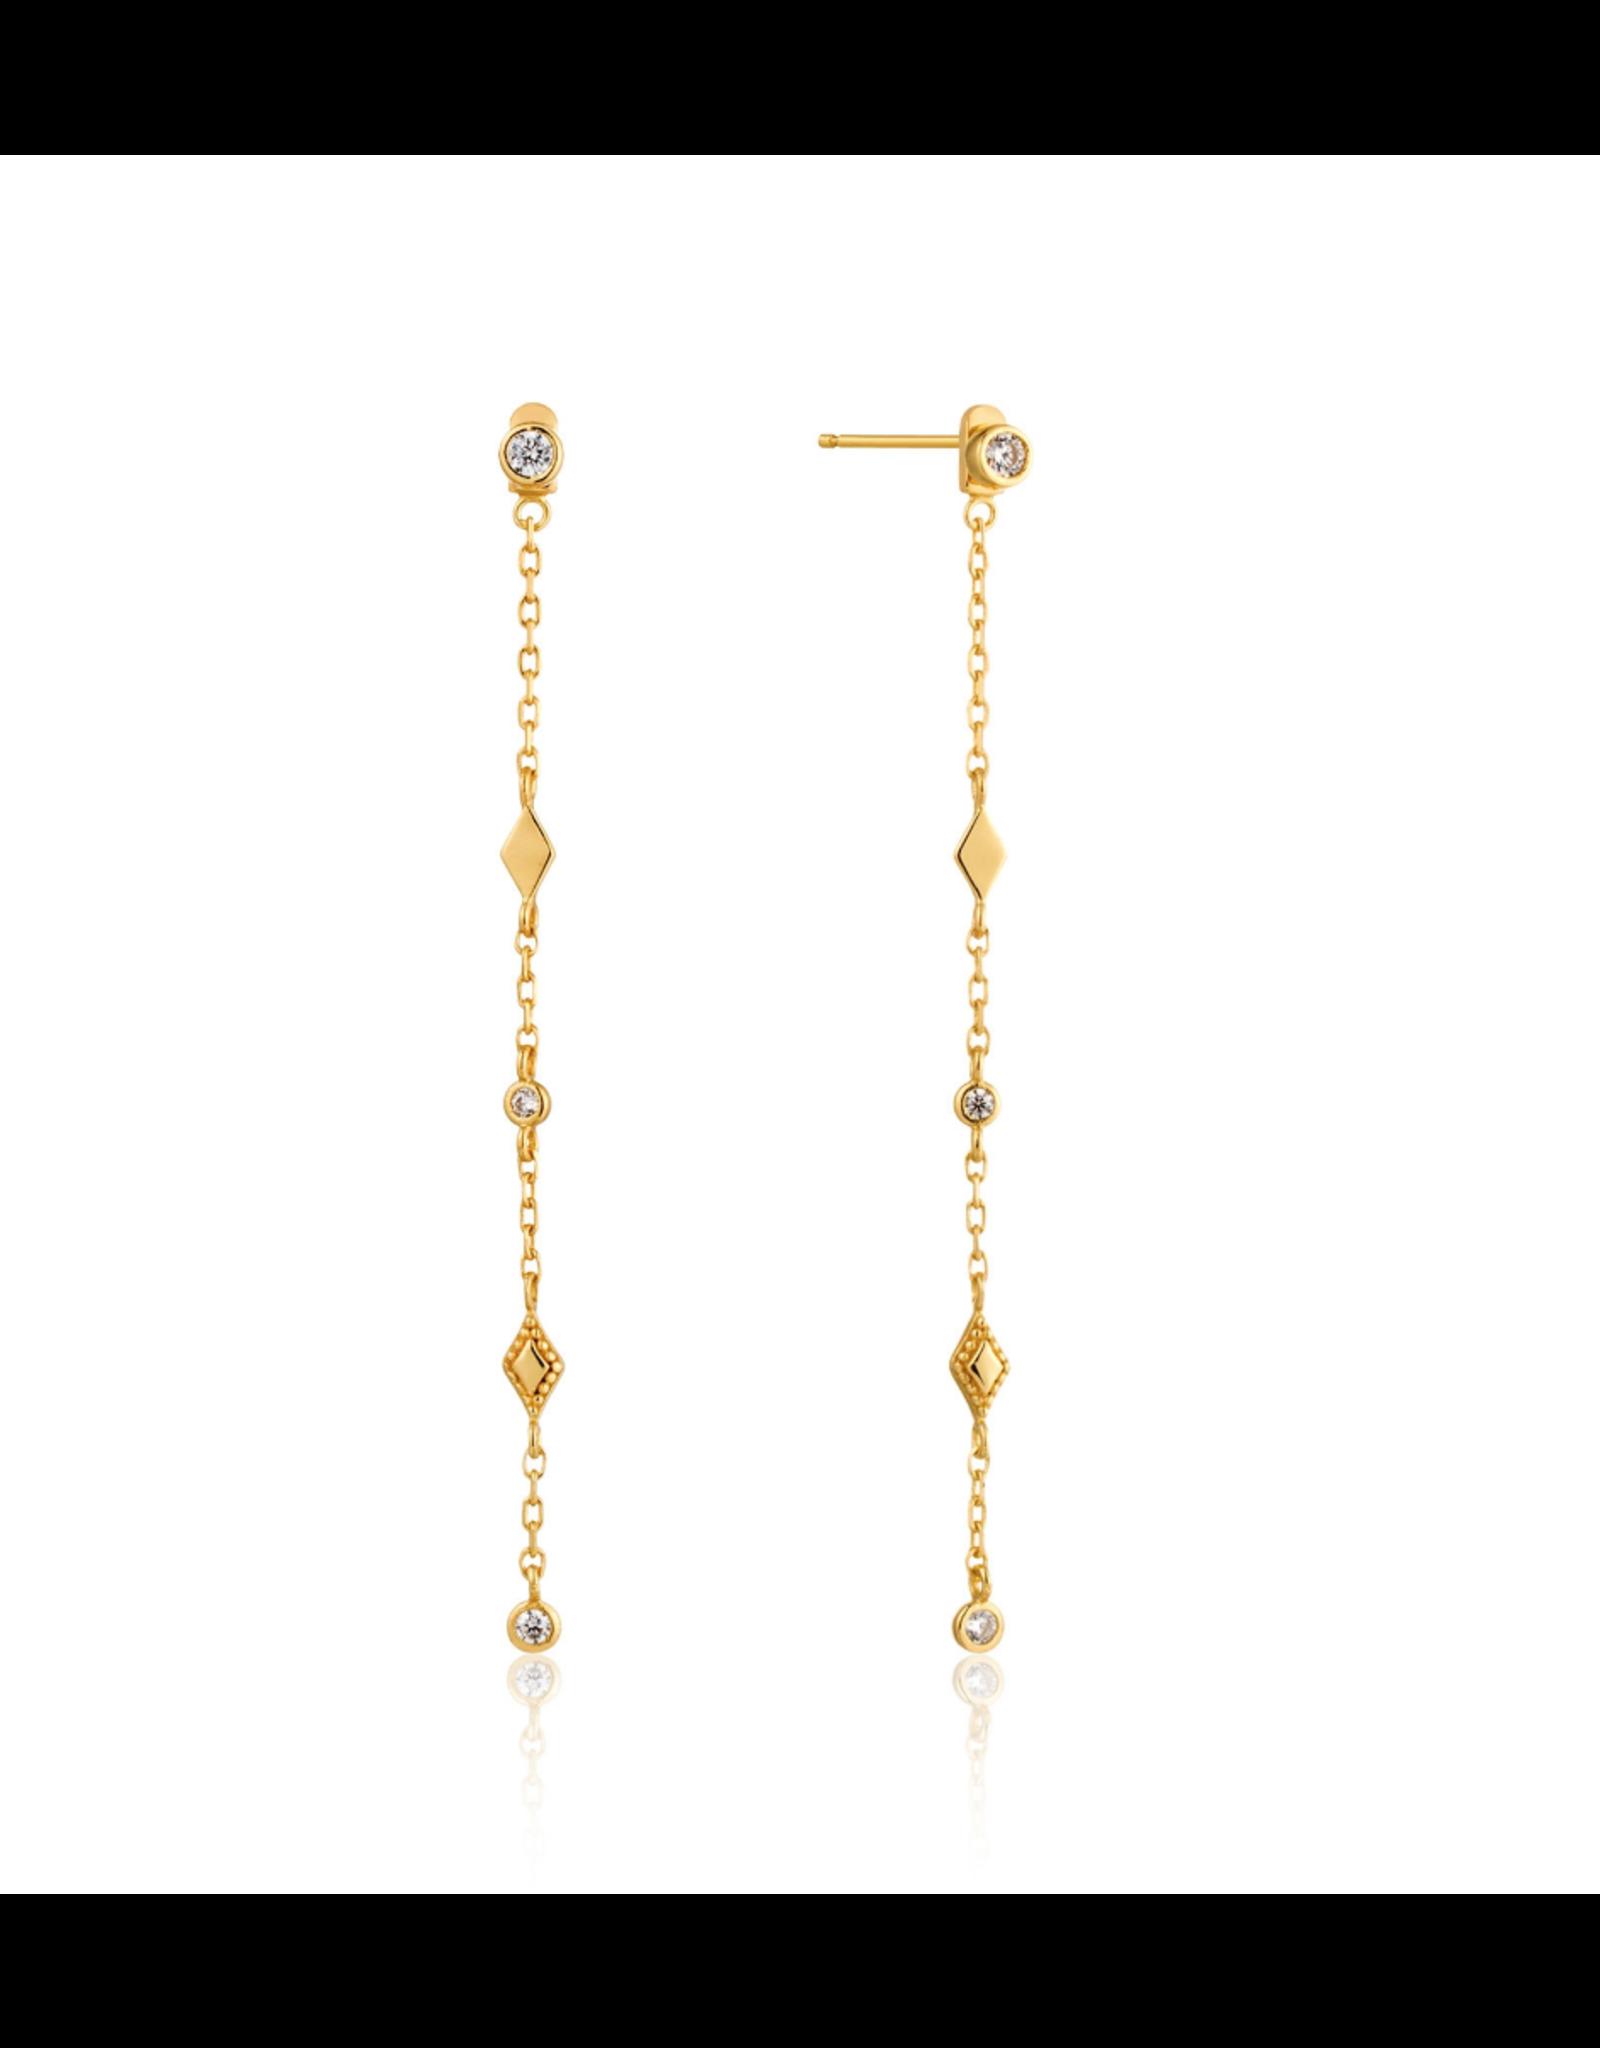 Ania Haie Bohemia Shimmer Drop Earrings, gold